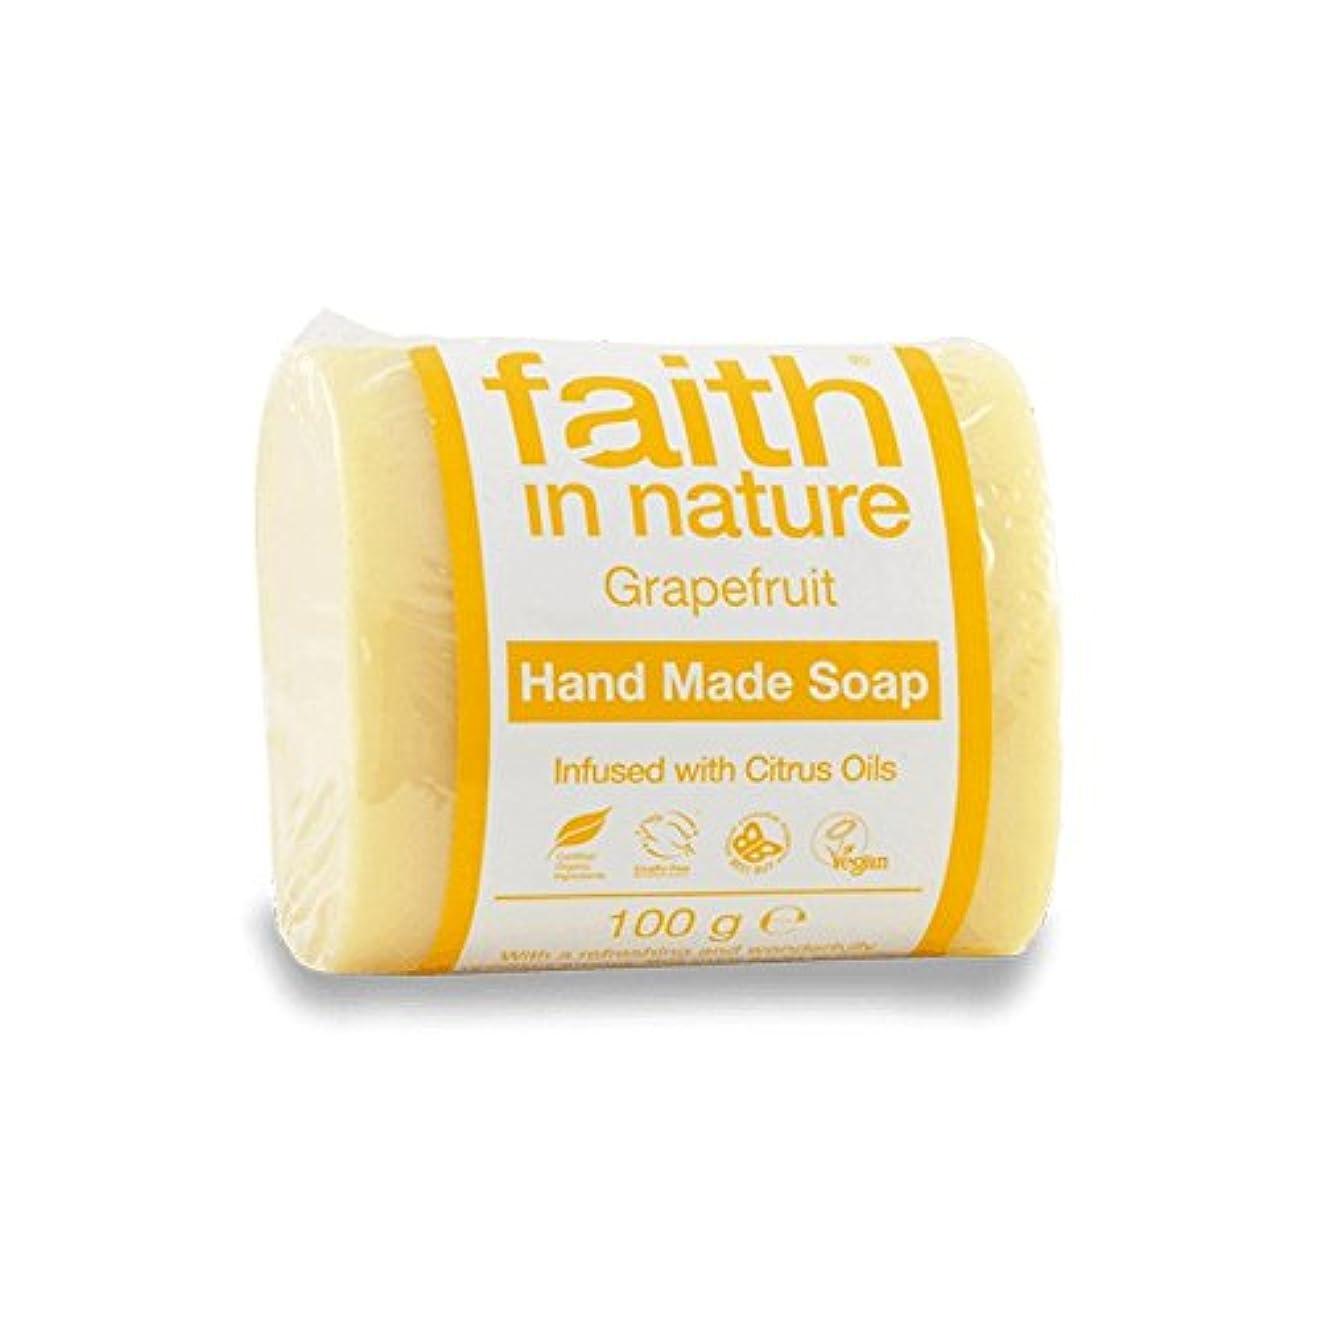 Faith in Nature Grapefruit Soap 100g (Pack of 6) - 自然グレープフルーツ石鹸100グラムの信仰 (x6) [並行輸入品]